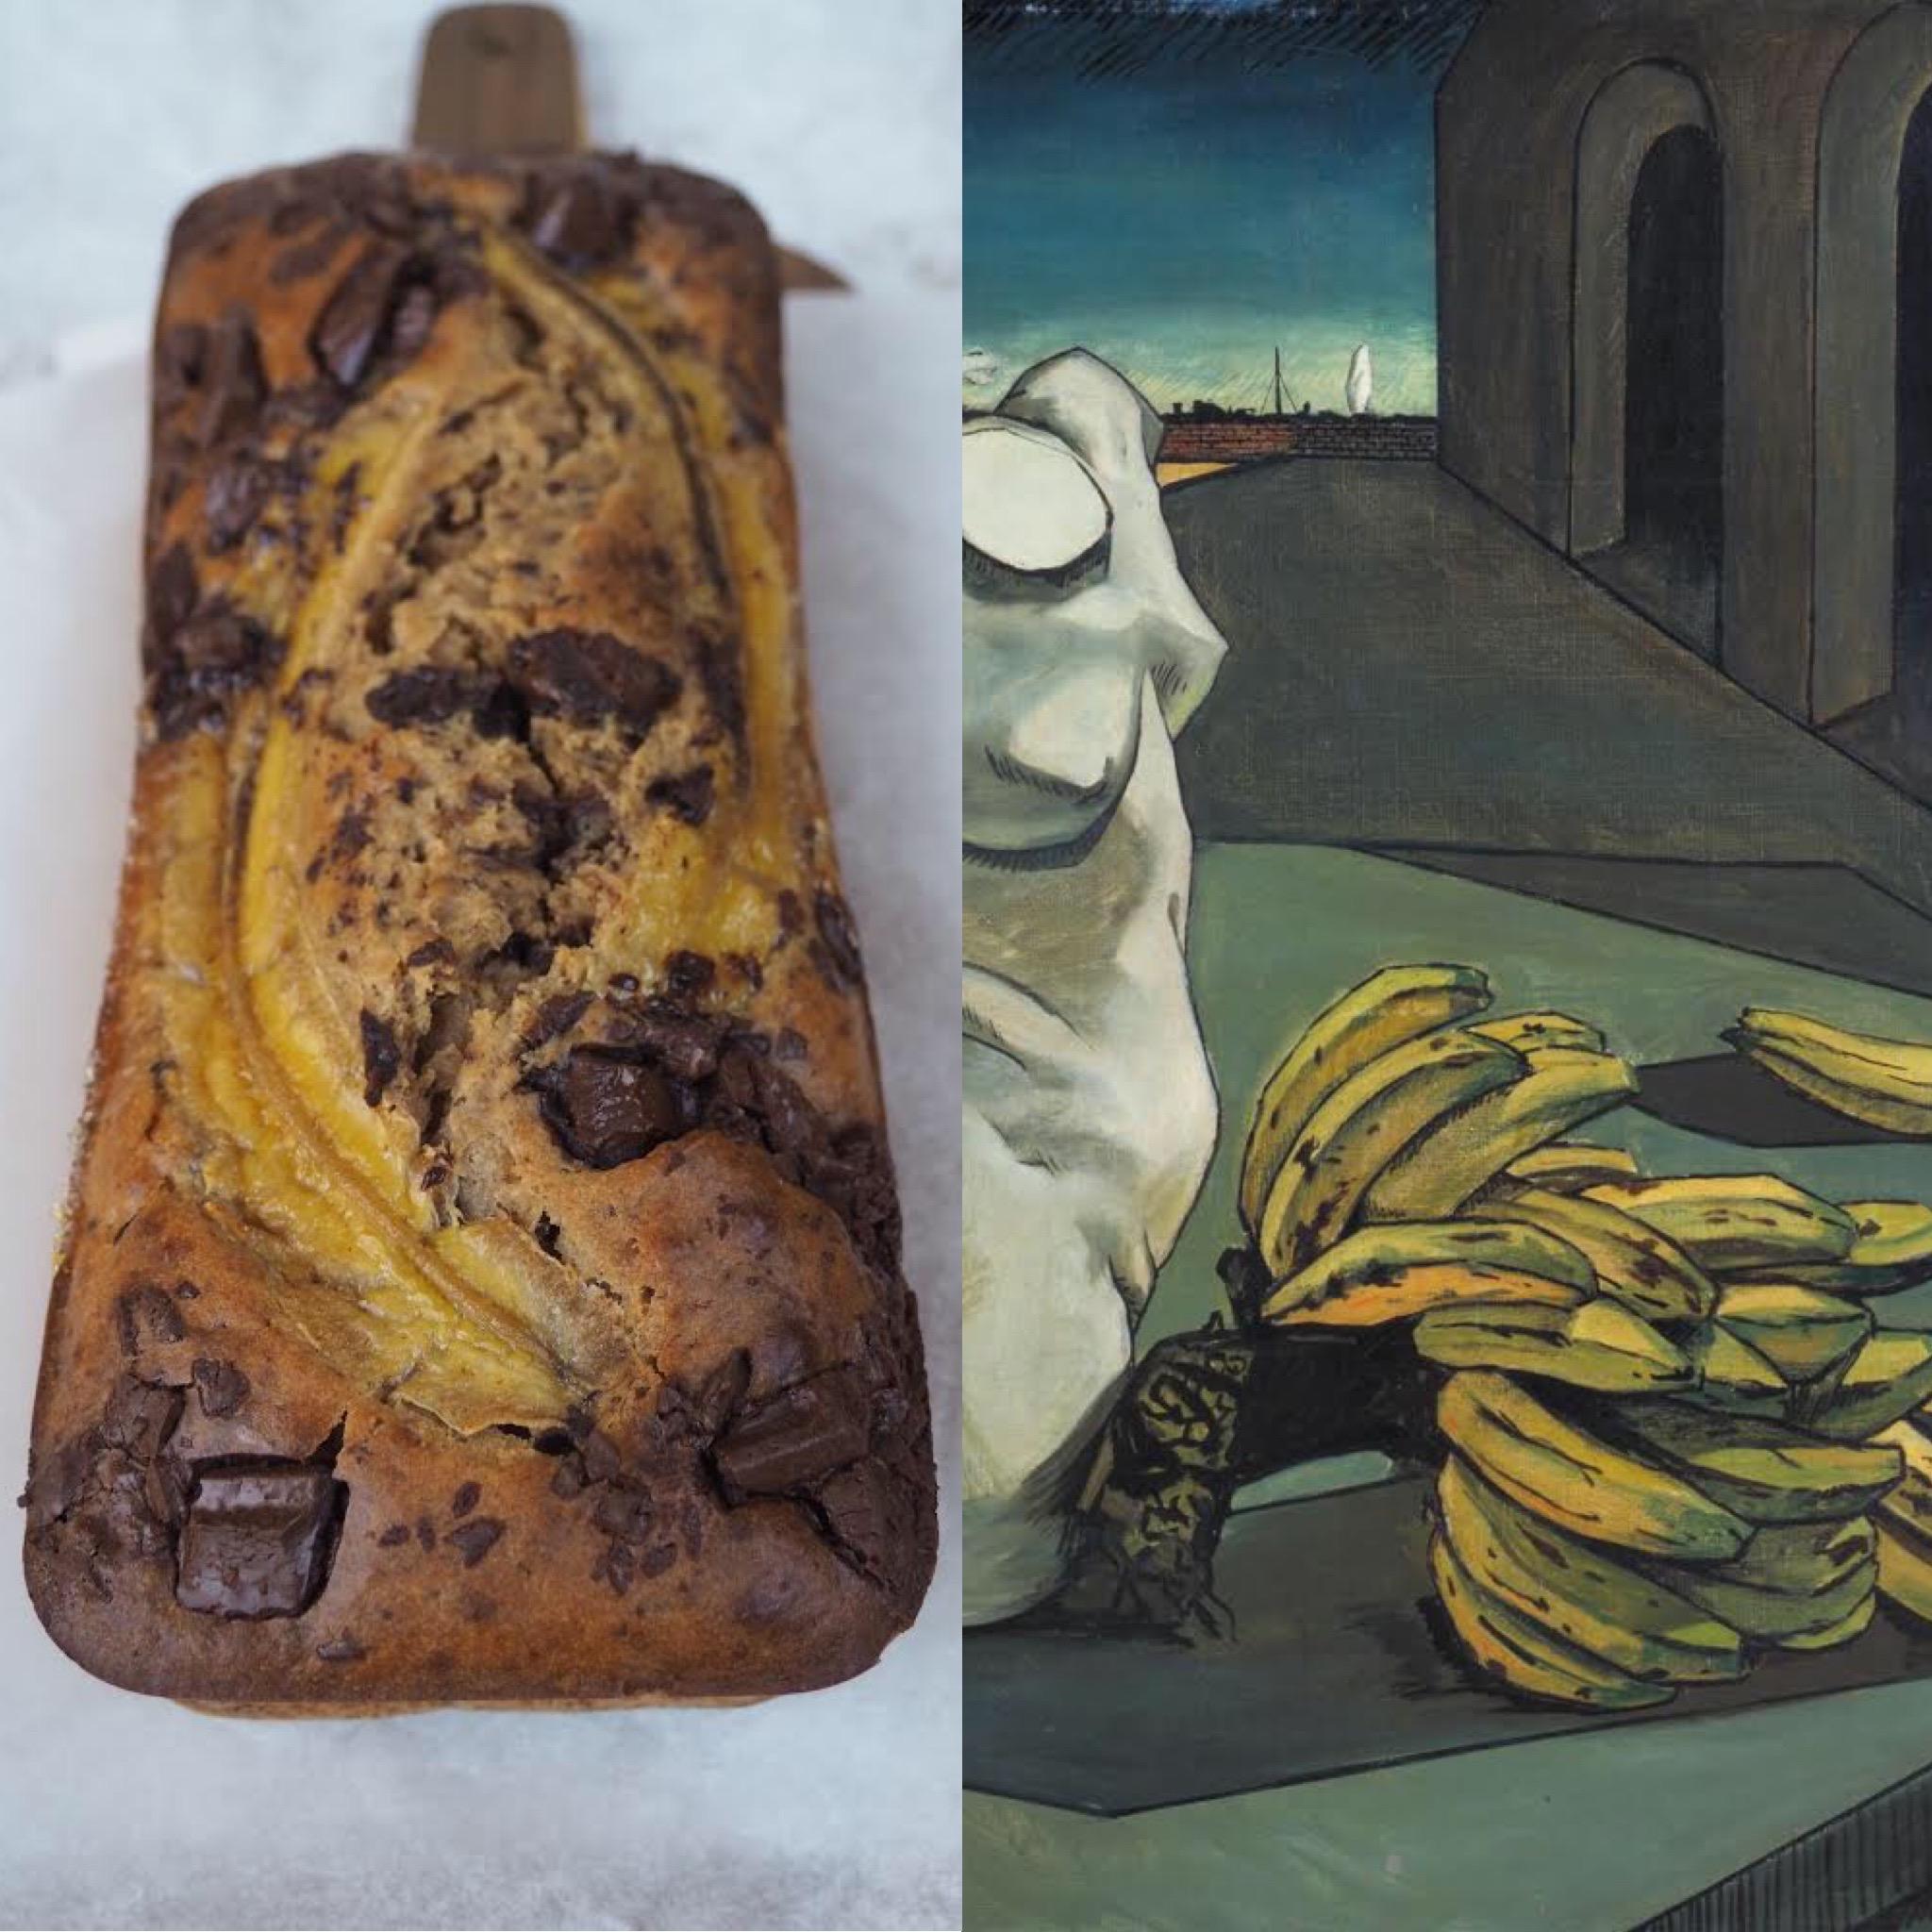 La incertesa del  poeta, de Chirico i el banana bread (CAT)